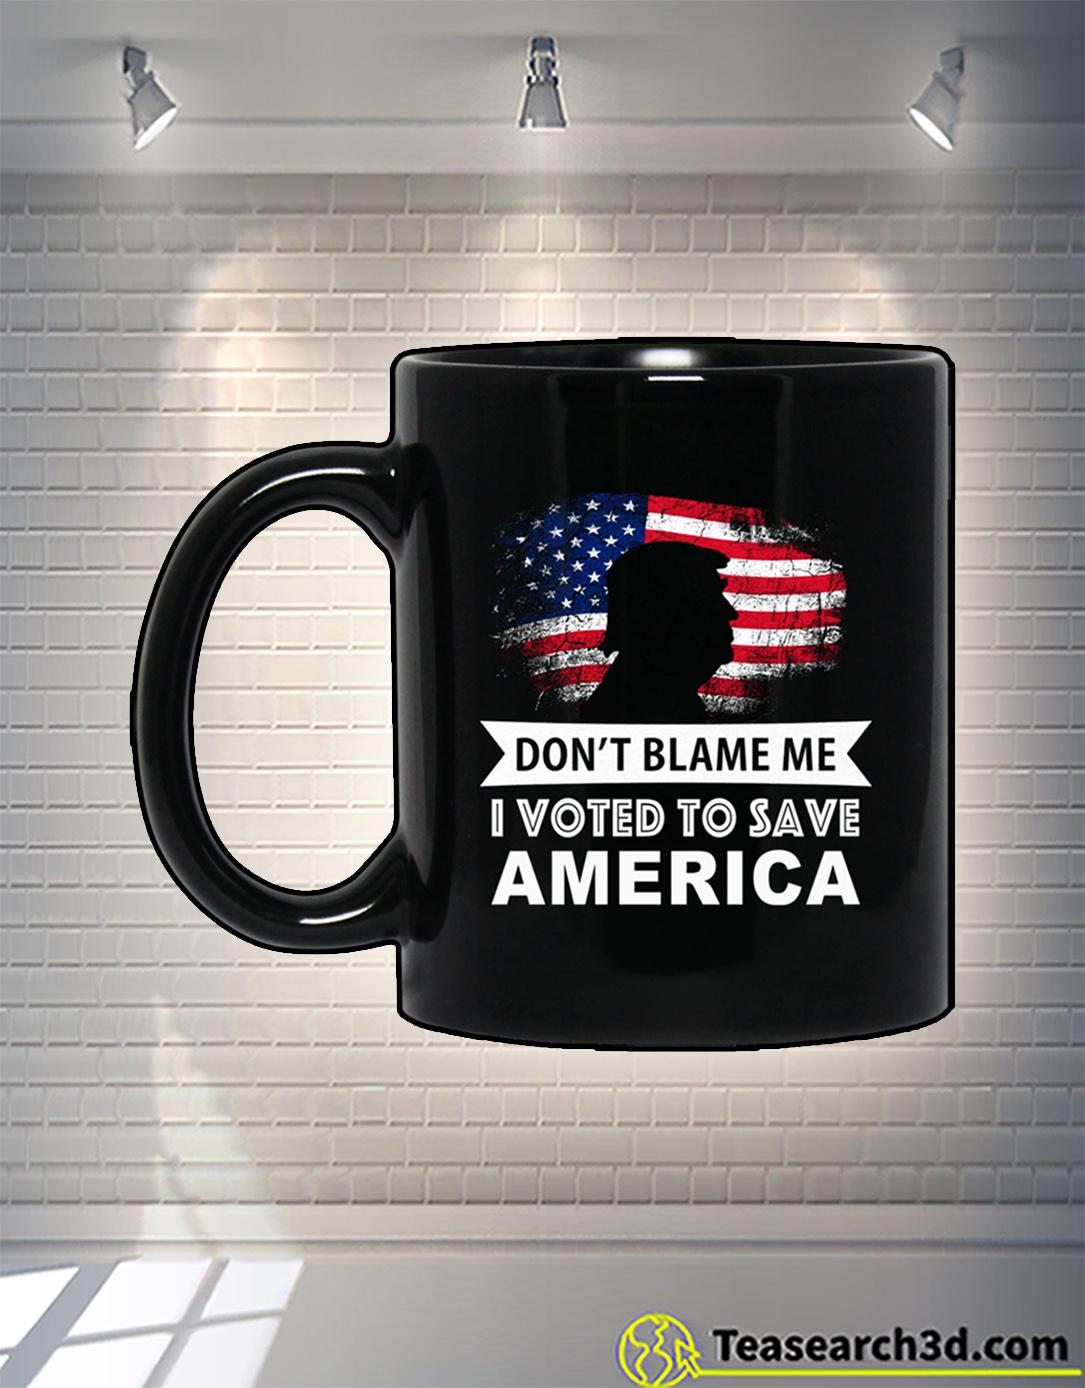 Don't blame me I voted to save america mug 15oz